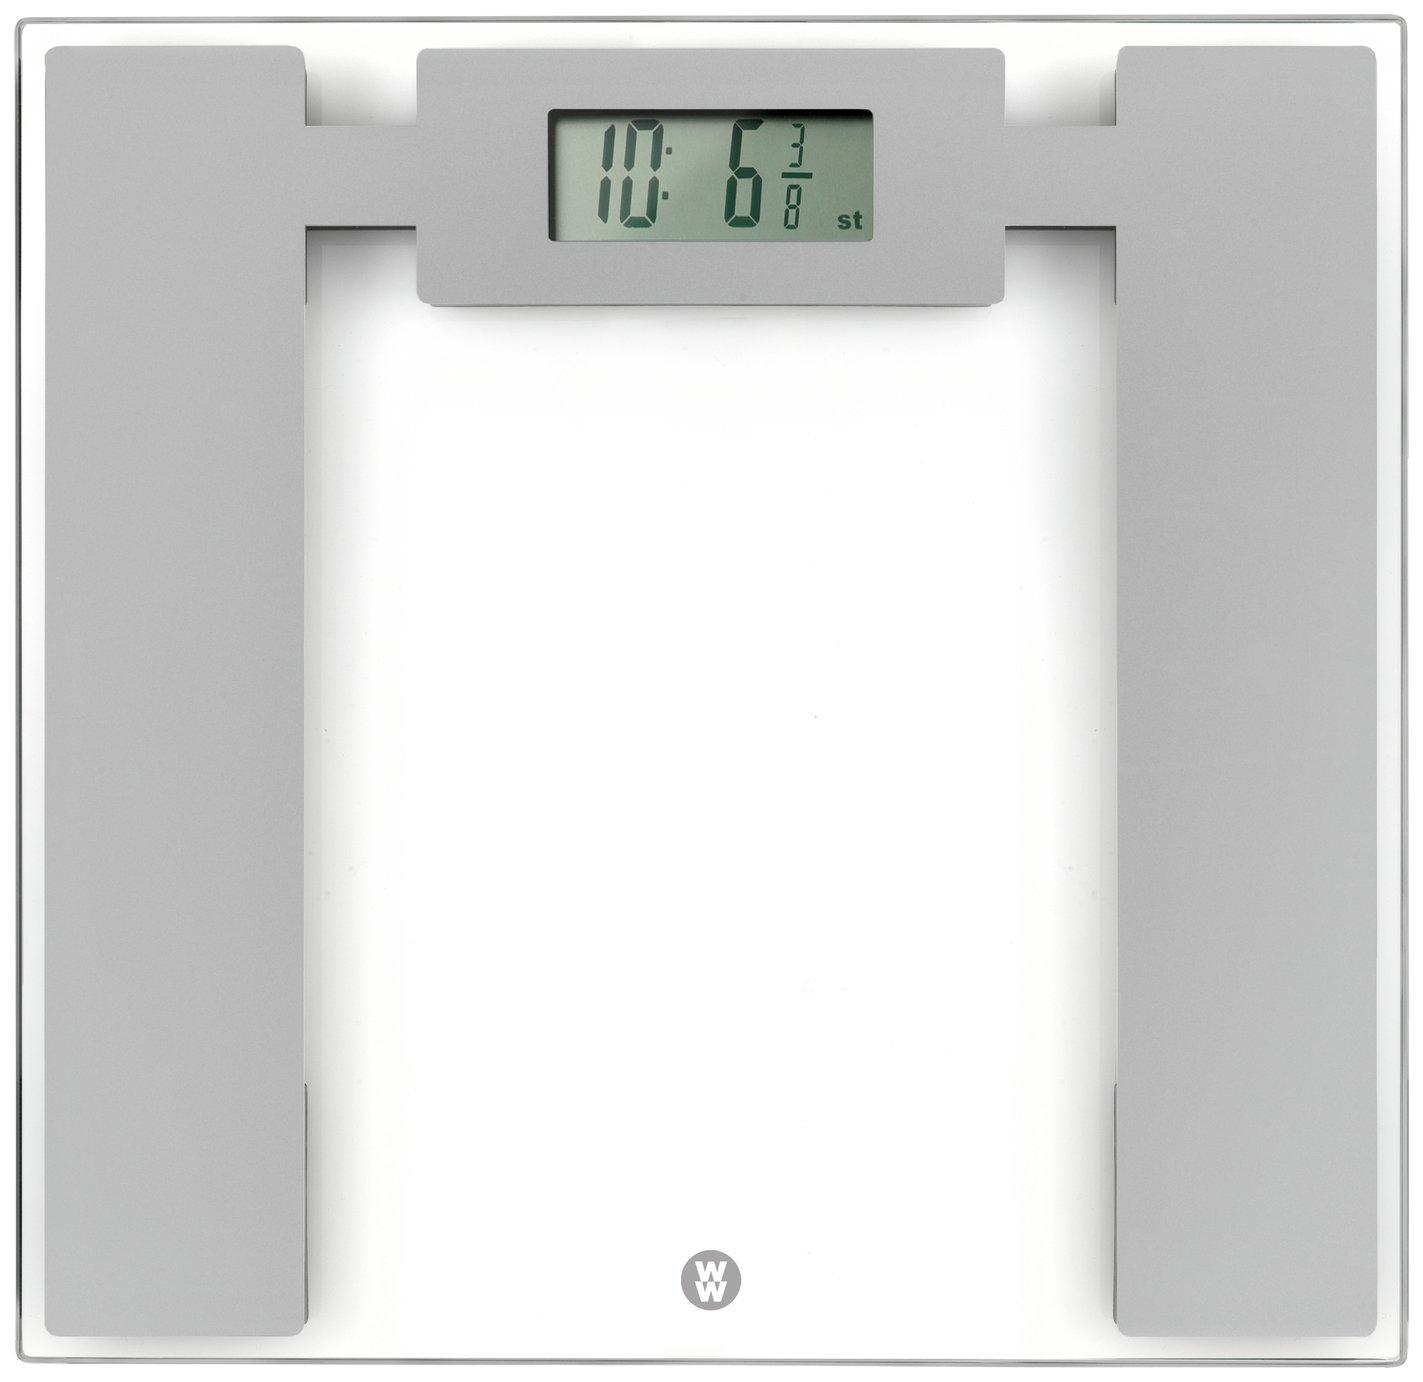 wilko bathroom scales elegant wilko hp xl black inkjet. Black Bedroom Furniture Sets. Home Design Ideas